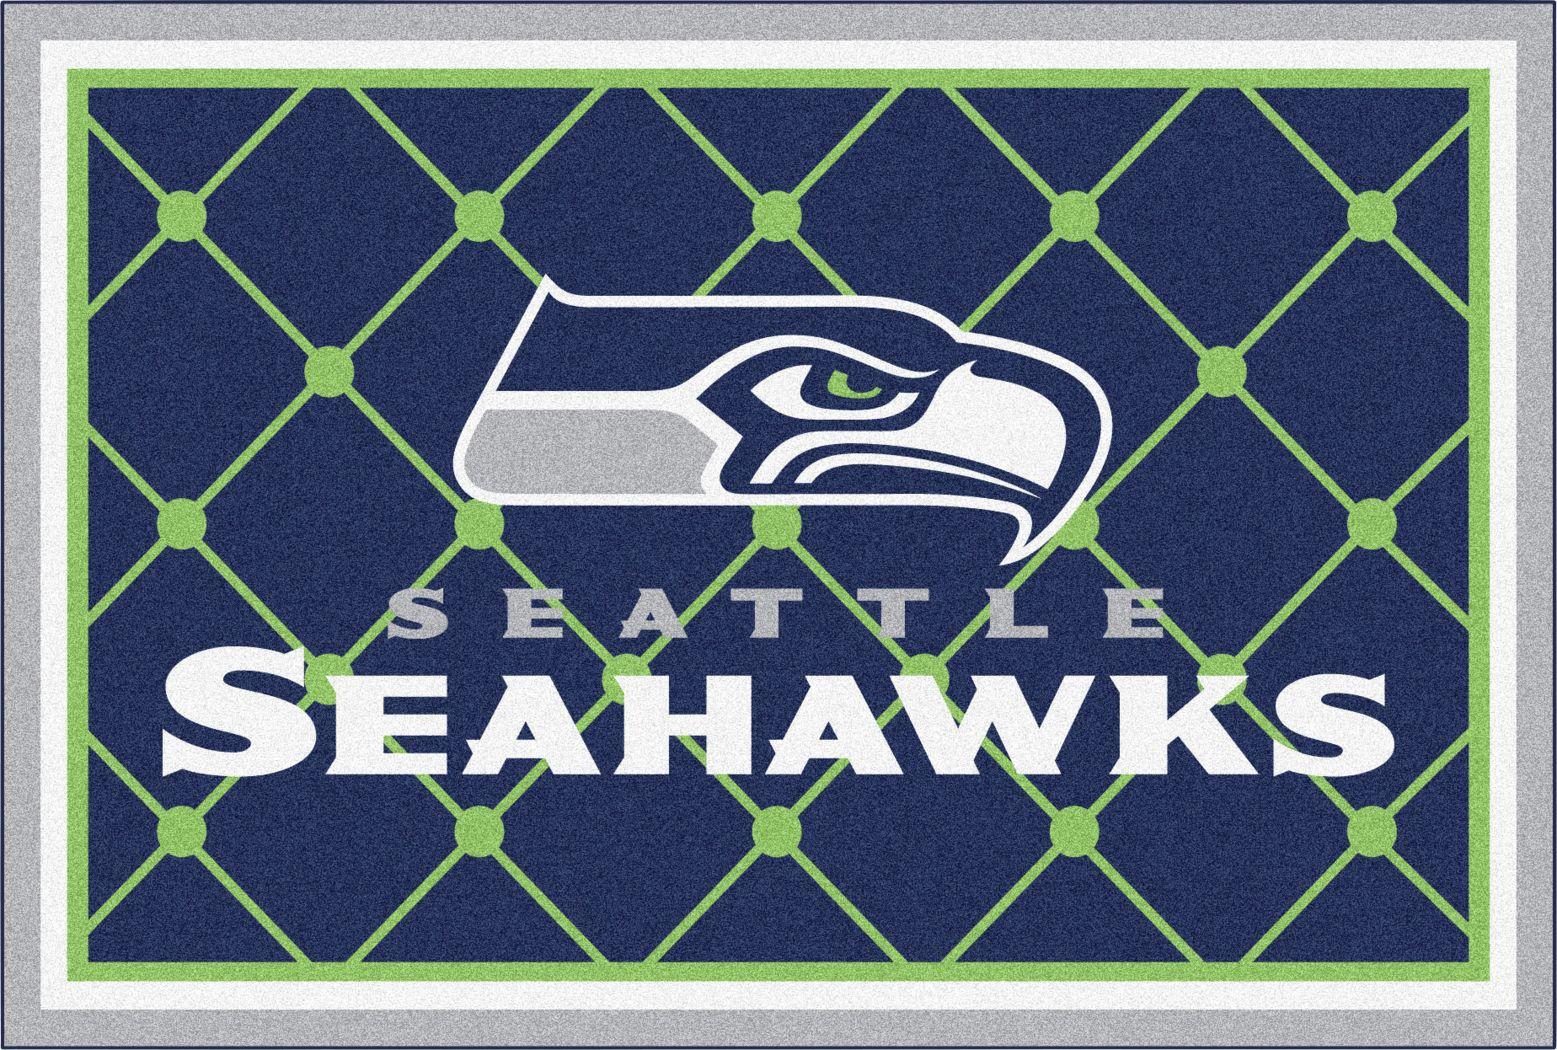 NFL Big Game Seattle Seahawks 5' x 8' Rug